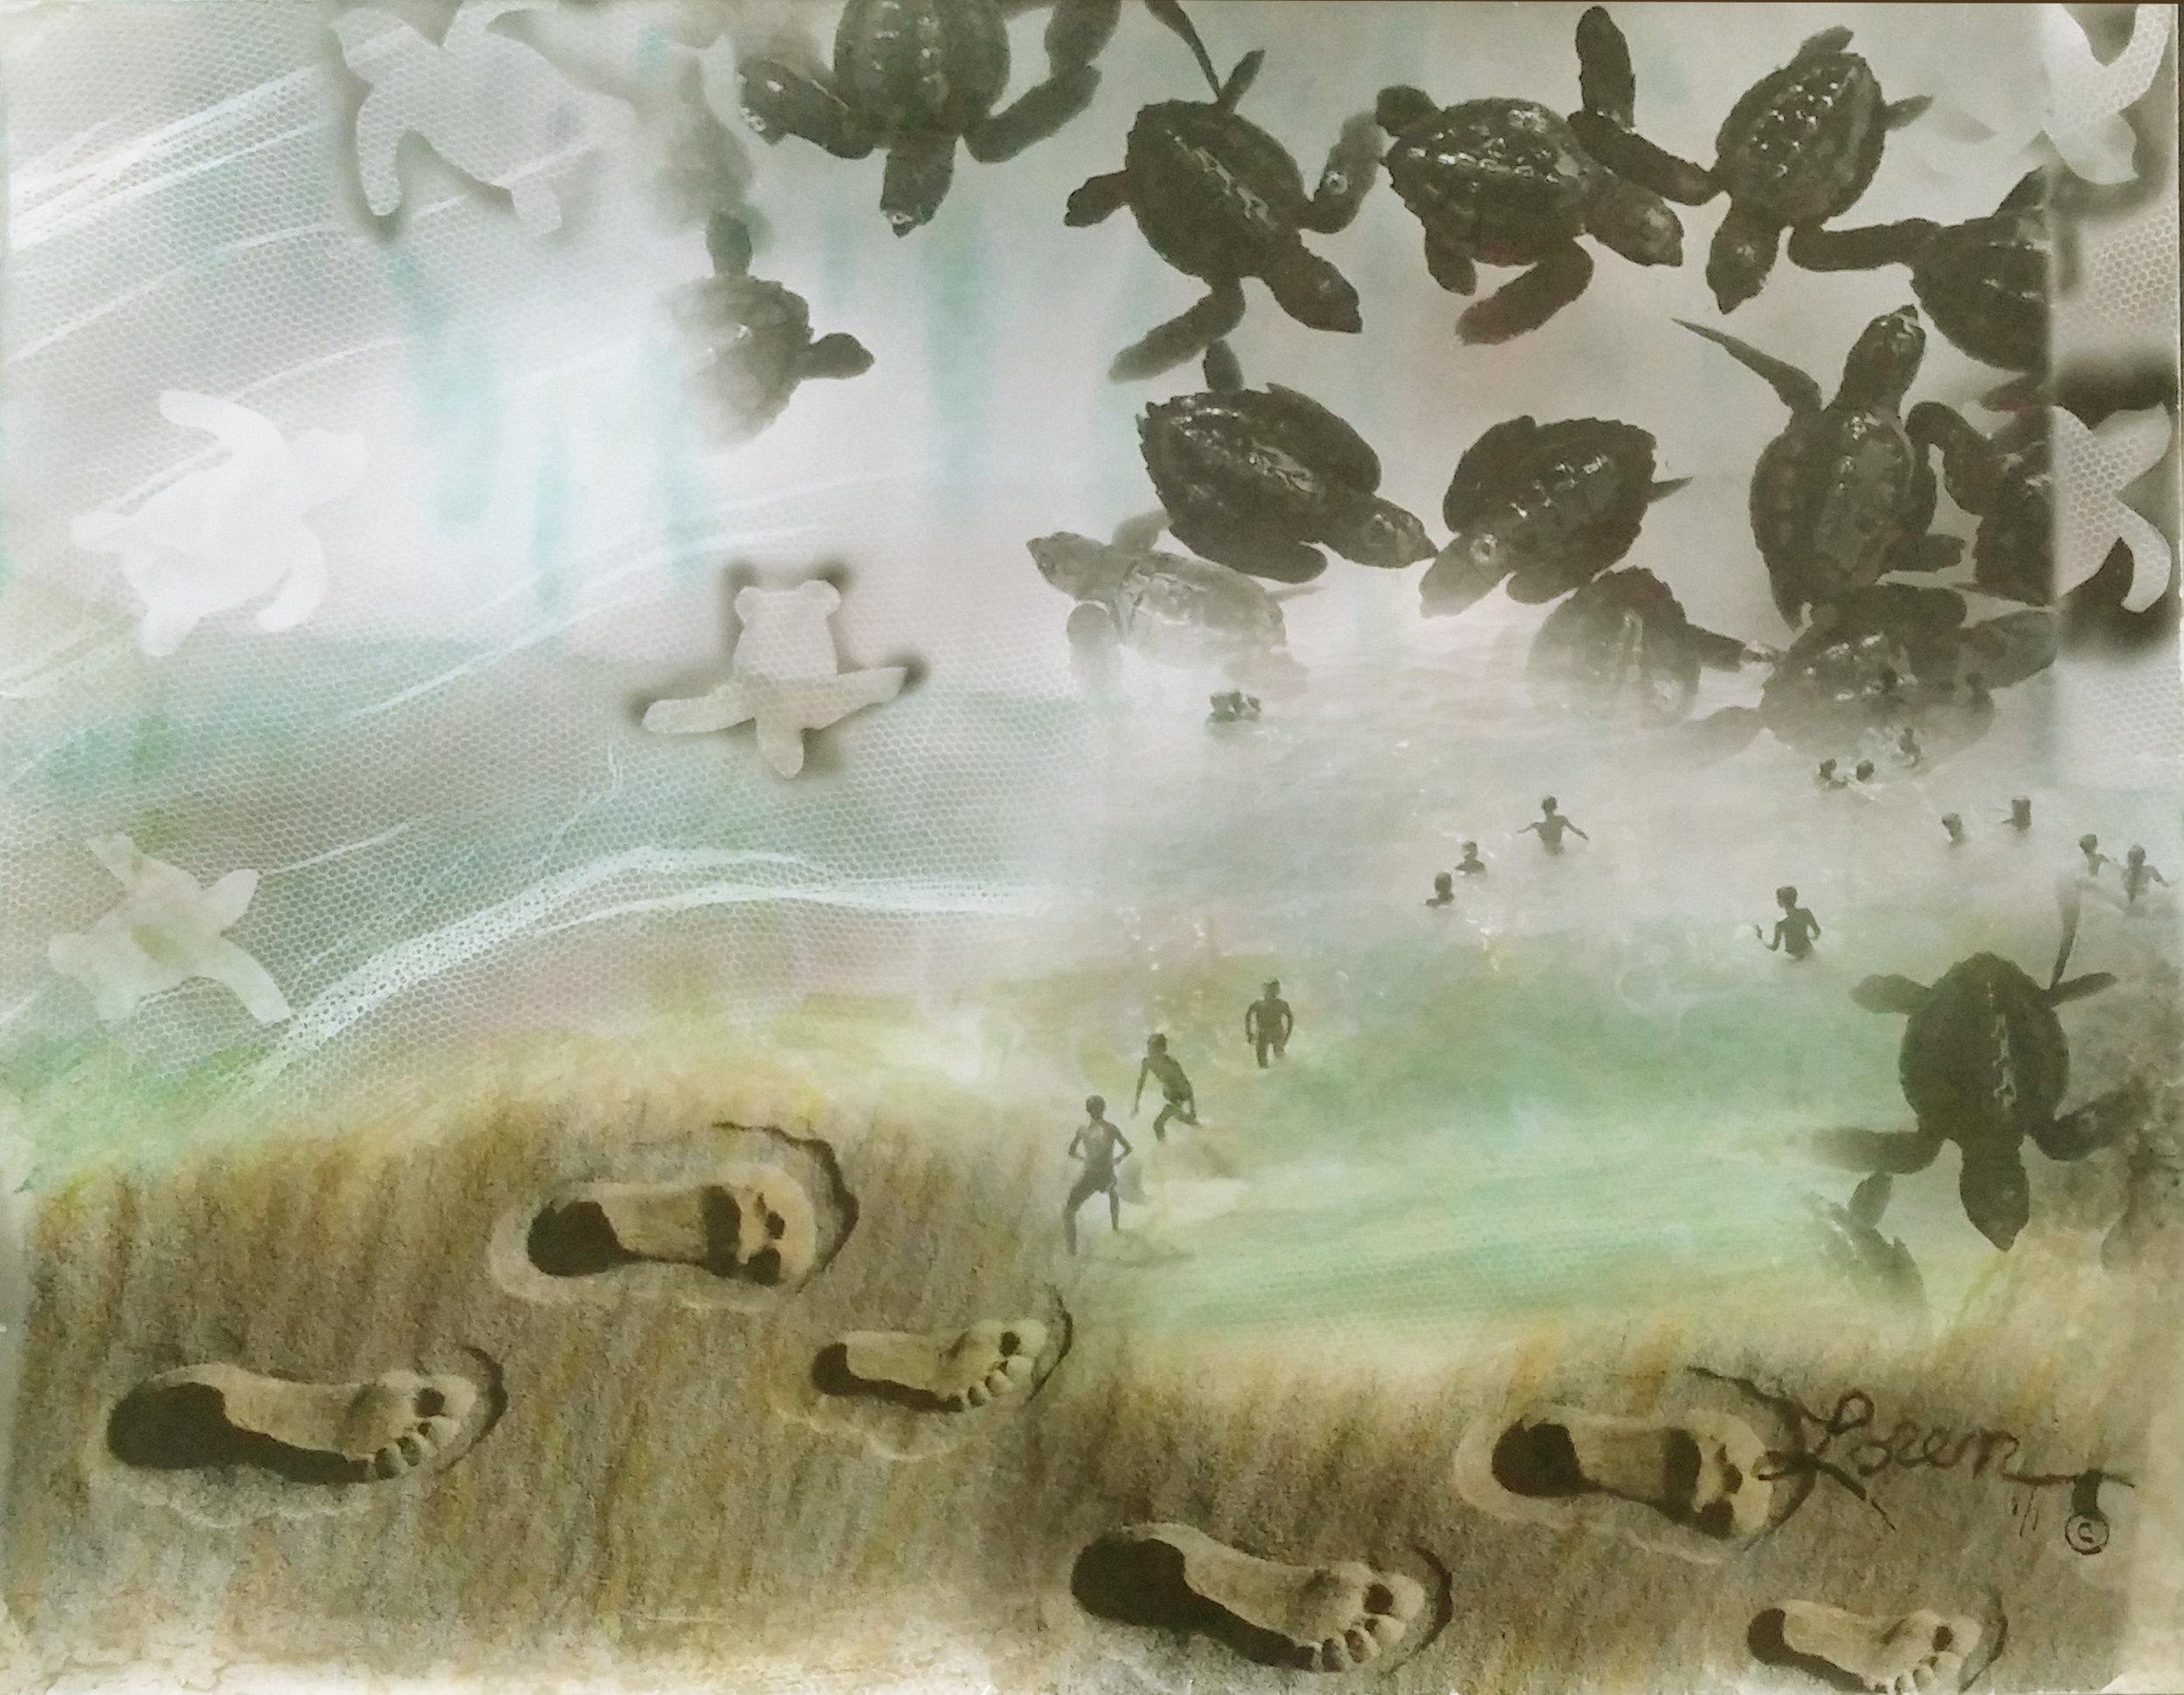 Ixtapa Mexico baby turtles to ocean via man 2 of 2   20 x 16.jpg